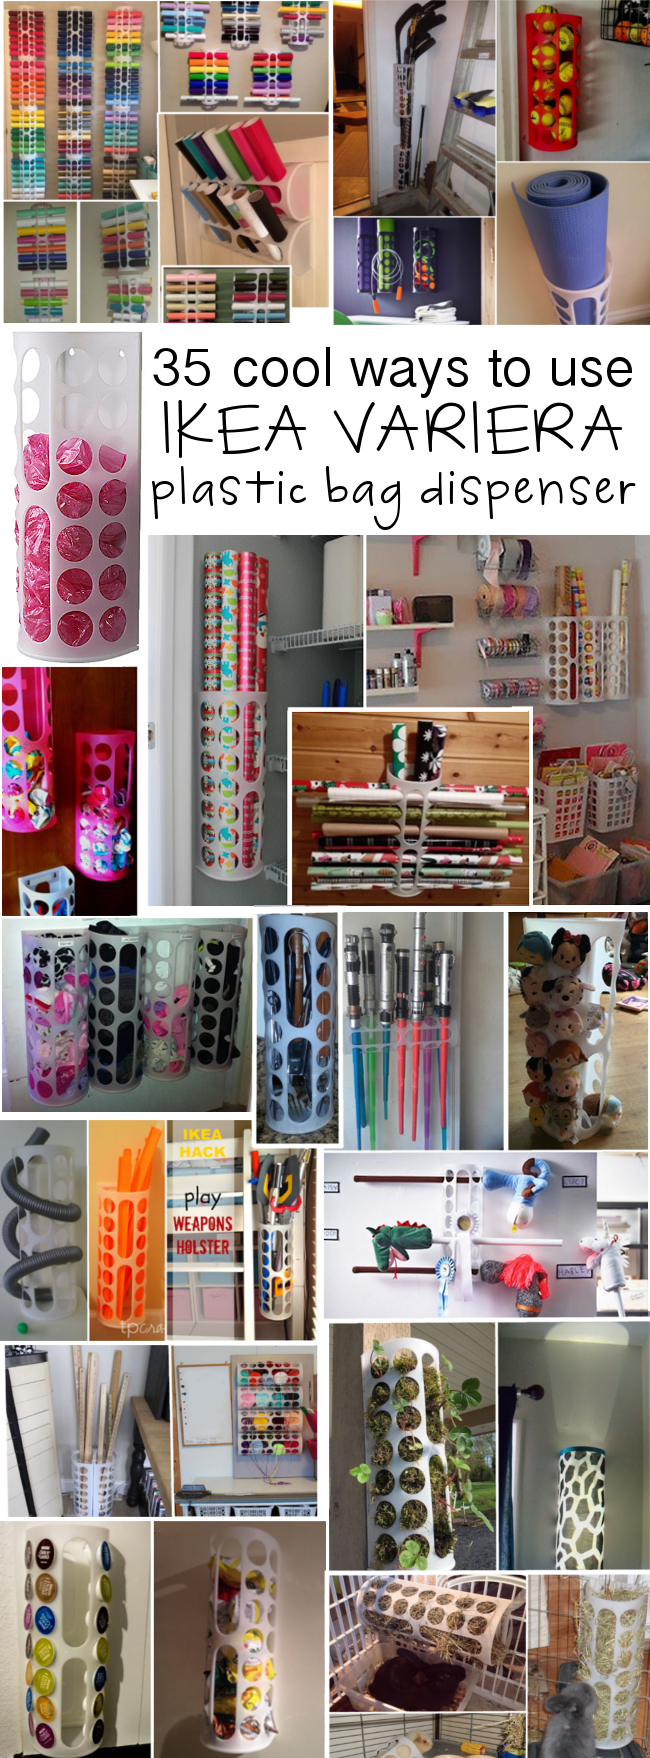 35 uses for IKEAu0027s VARIERA plastic bag dispenser & 35 uses for IKEAu0027s VARIERA plastic bag dispenser | Pinterest ...